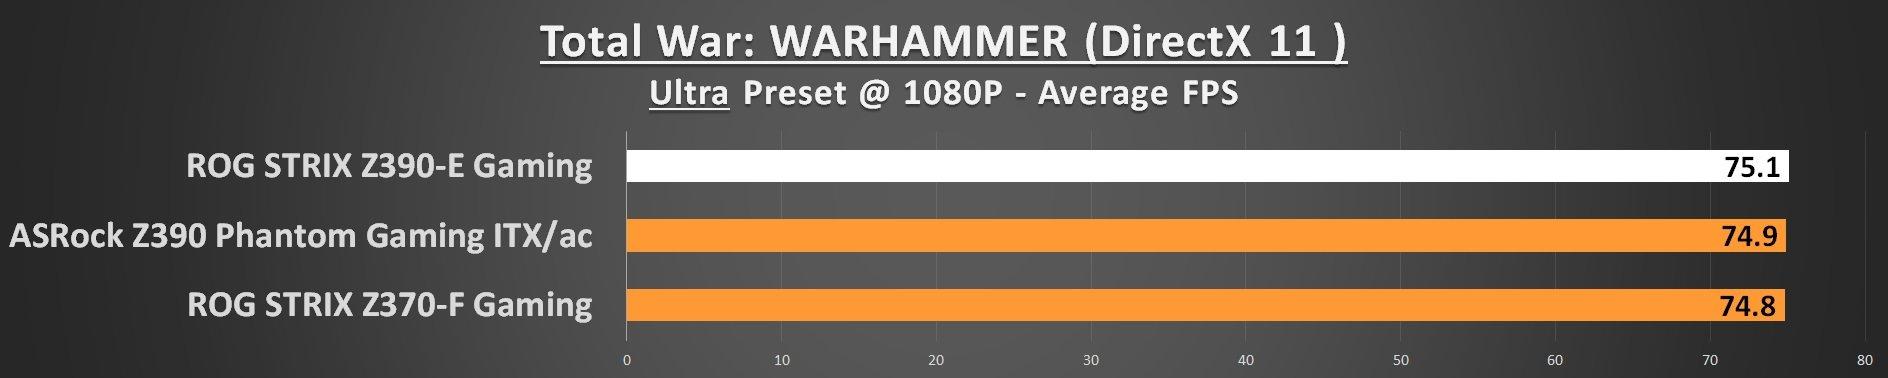 Total War Warhammer 1080p